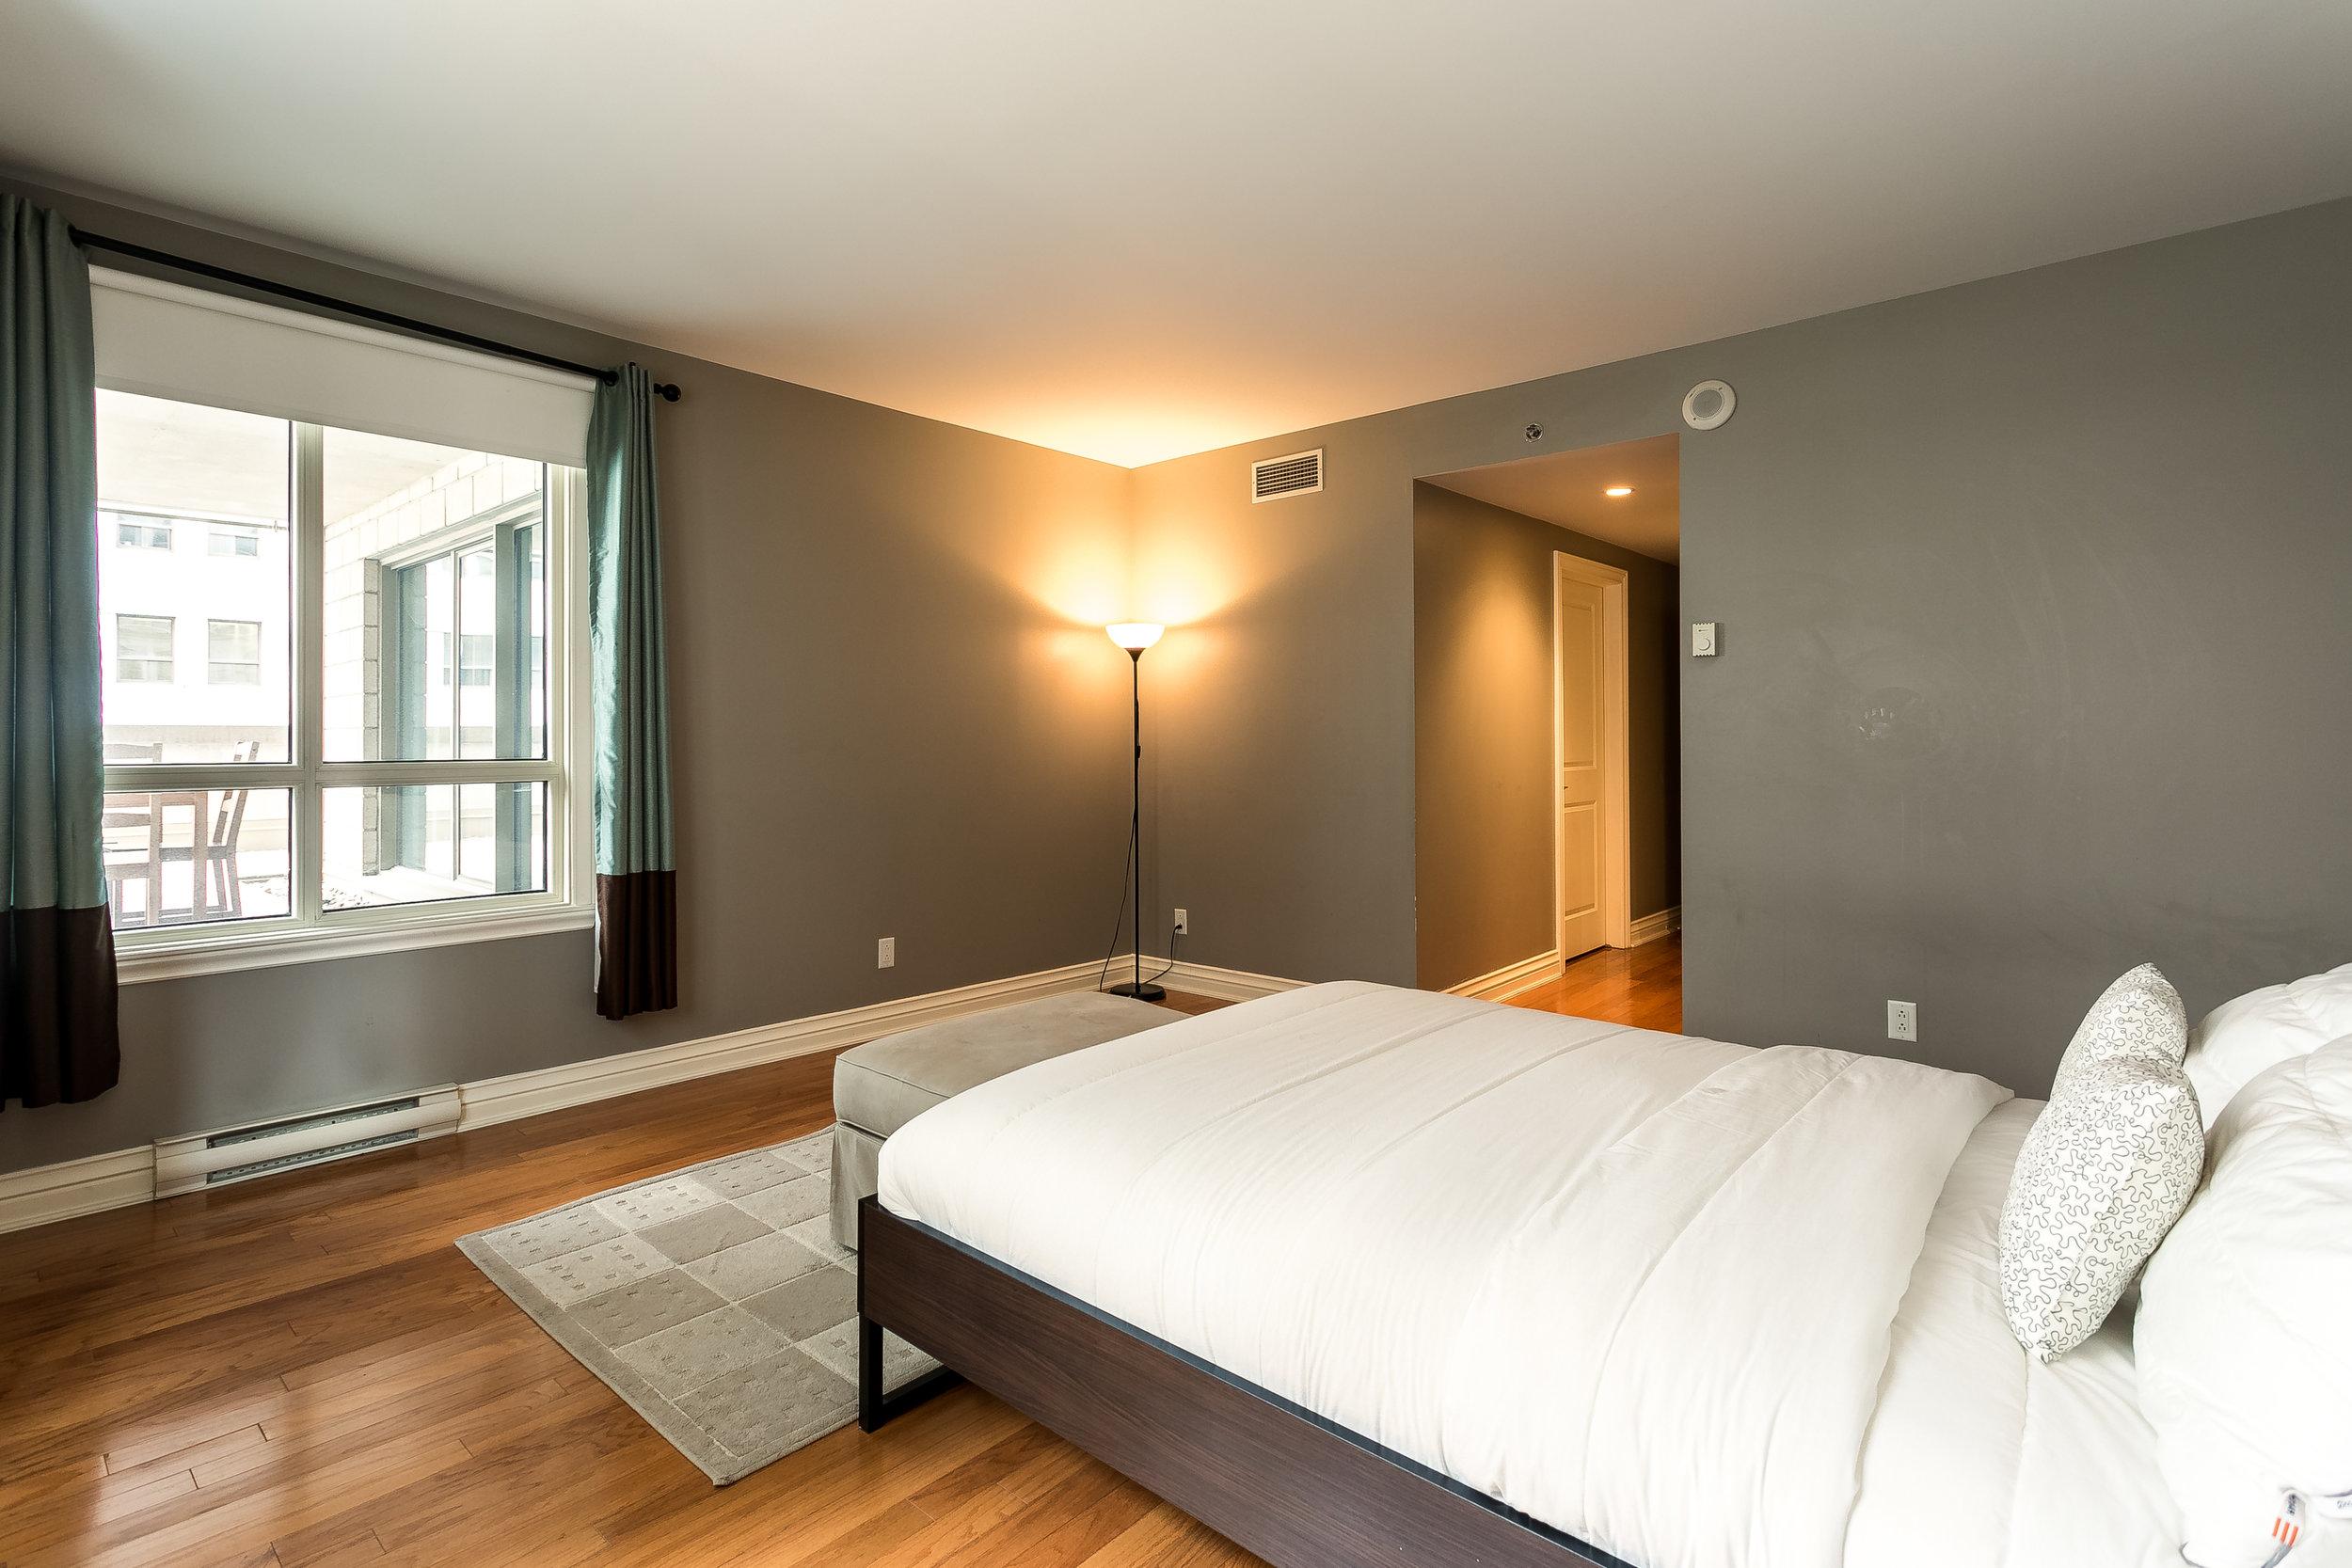 1200 bedroom 2 (1 of 1).jpg